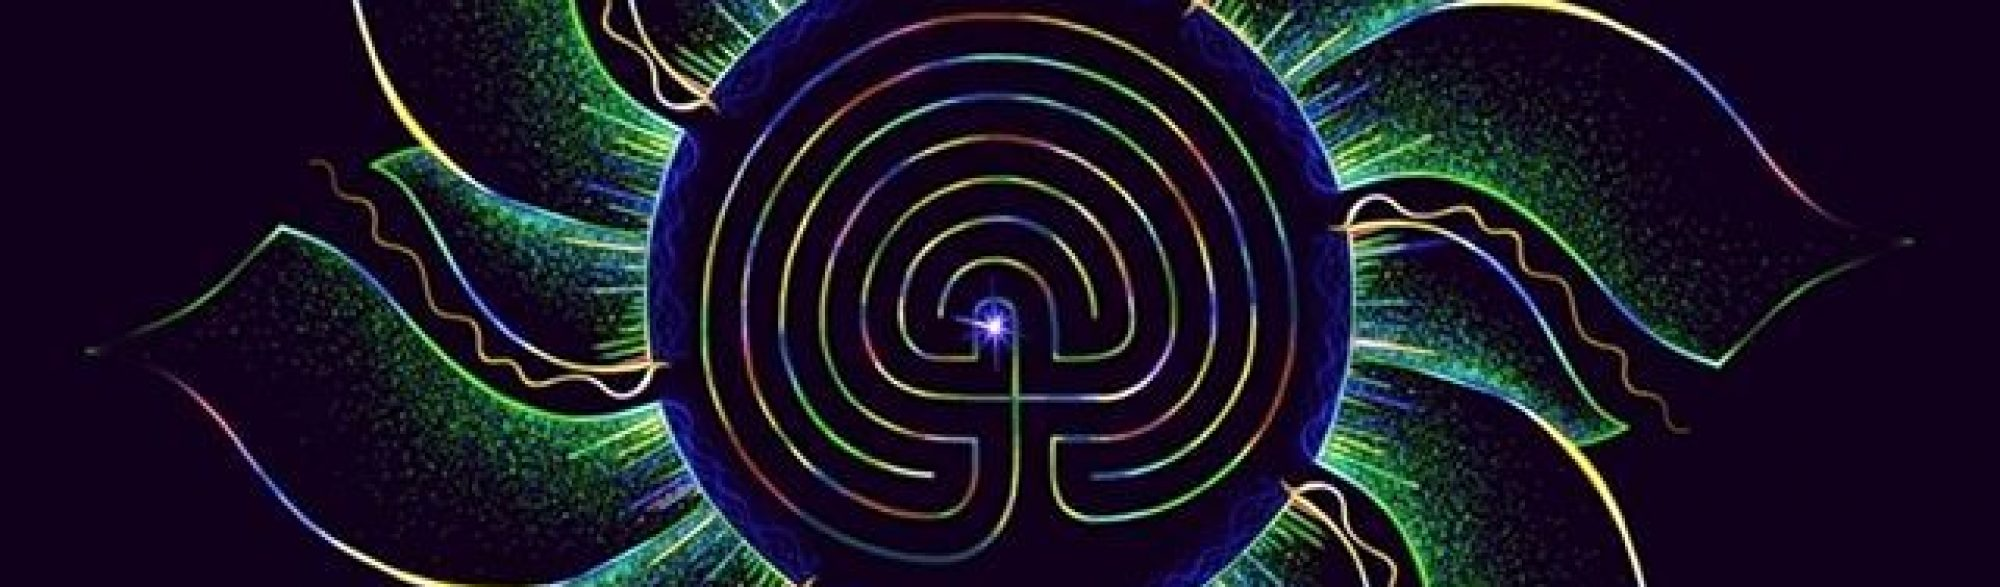 In Lakin's Labyrinth